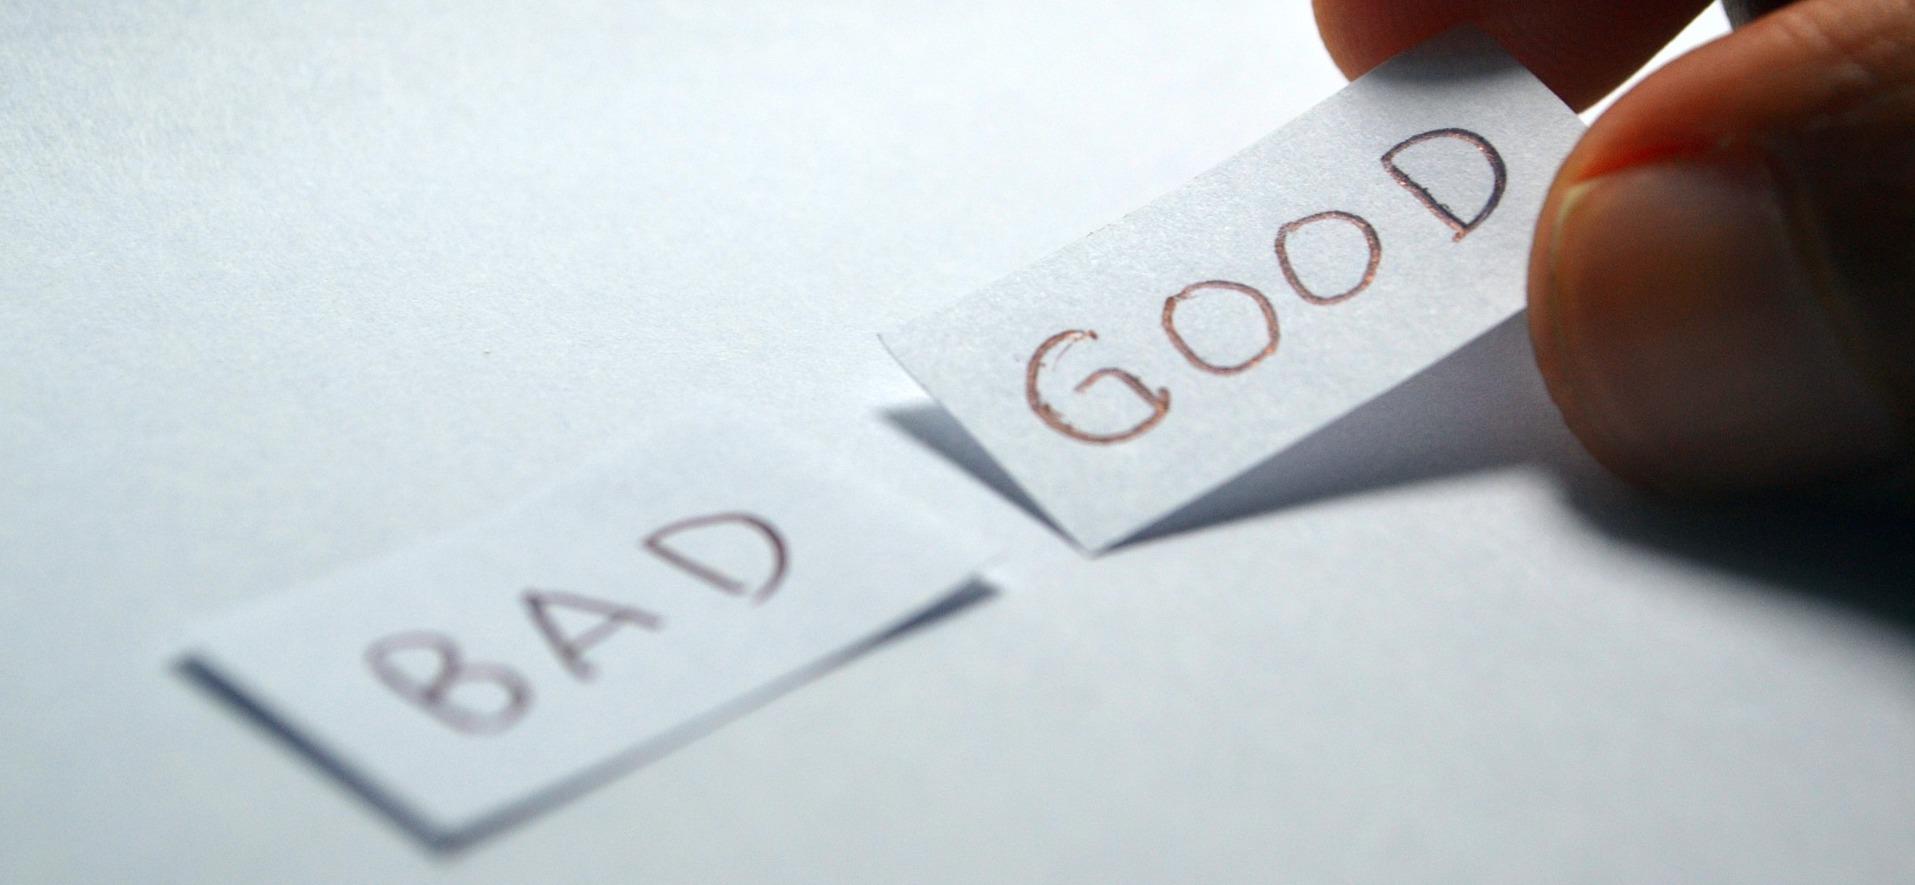 to-do-list-tips-good-bad